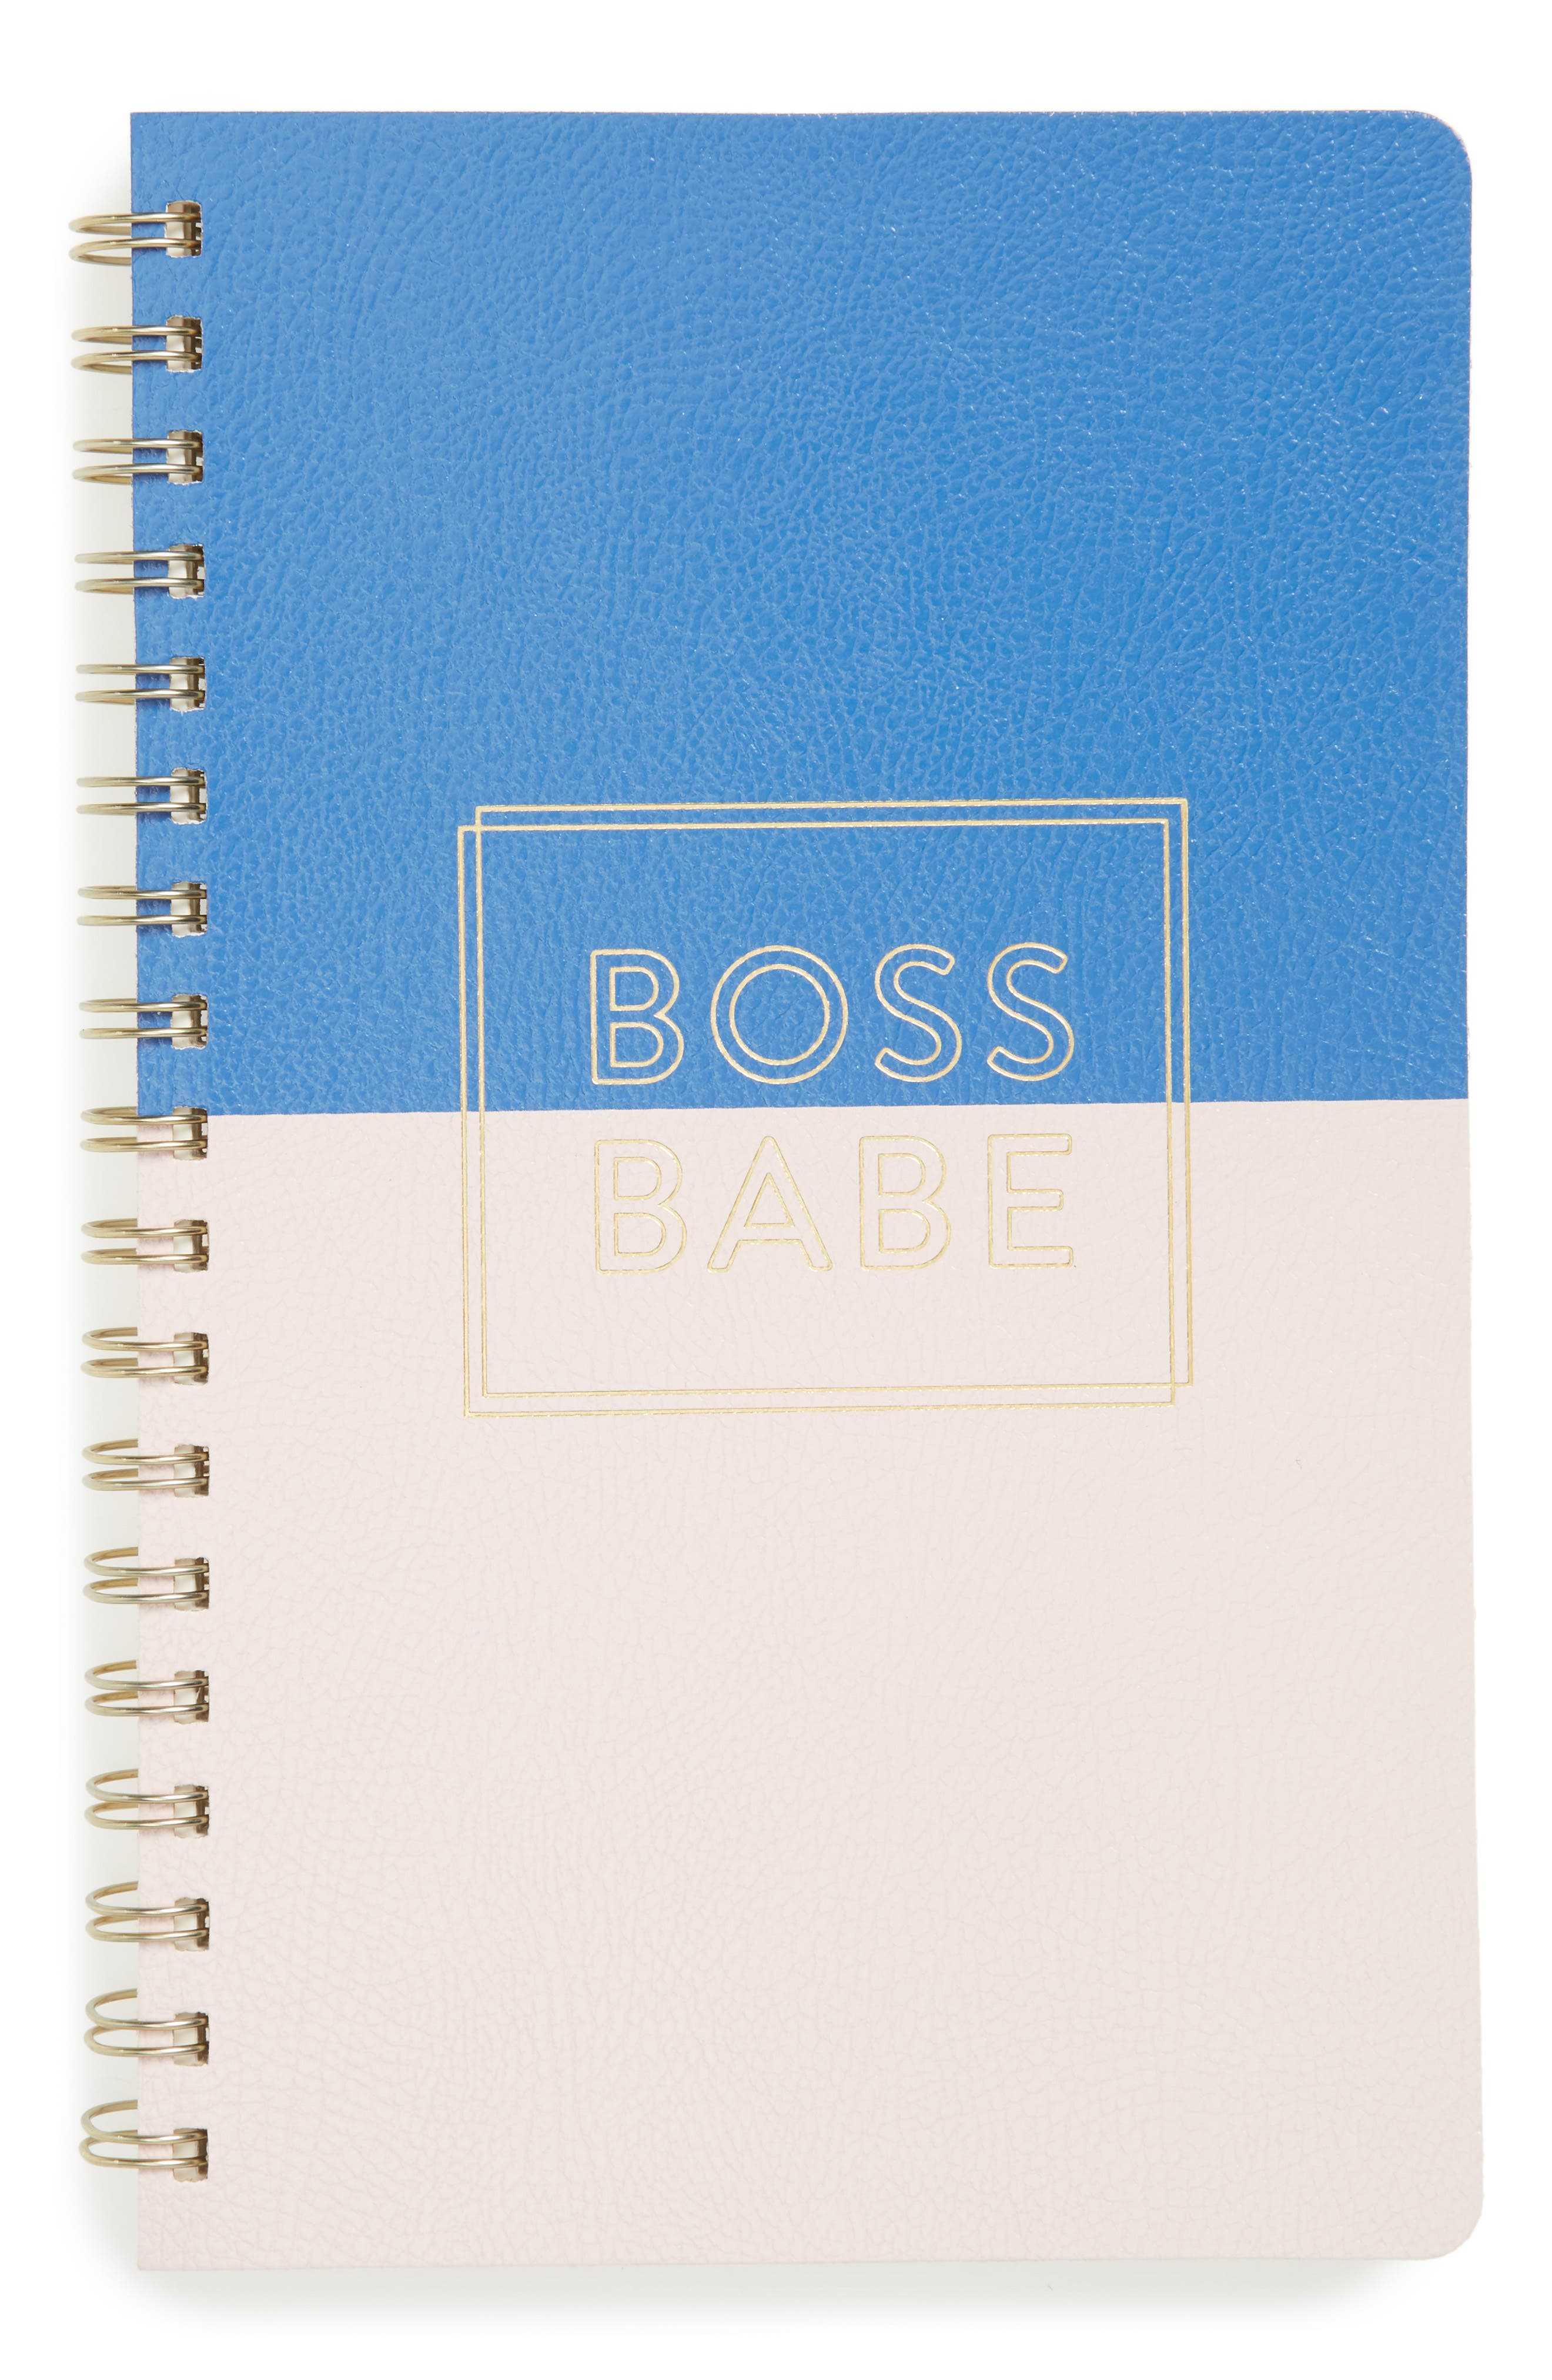 Main Image - Fringe Studio Boss Babe Spiral Notebook